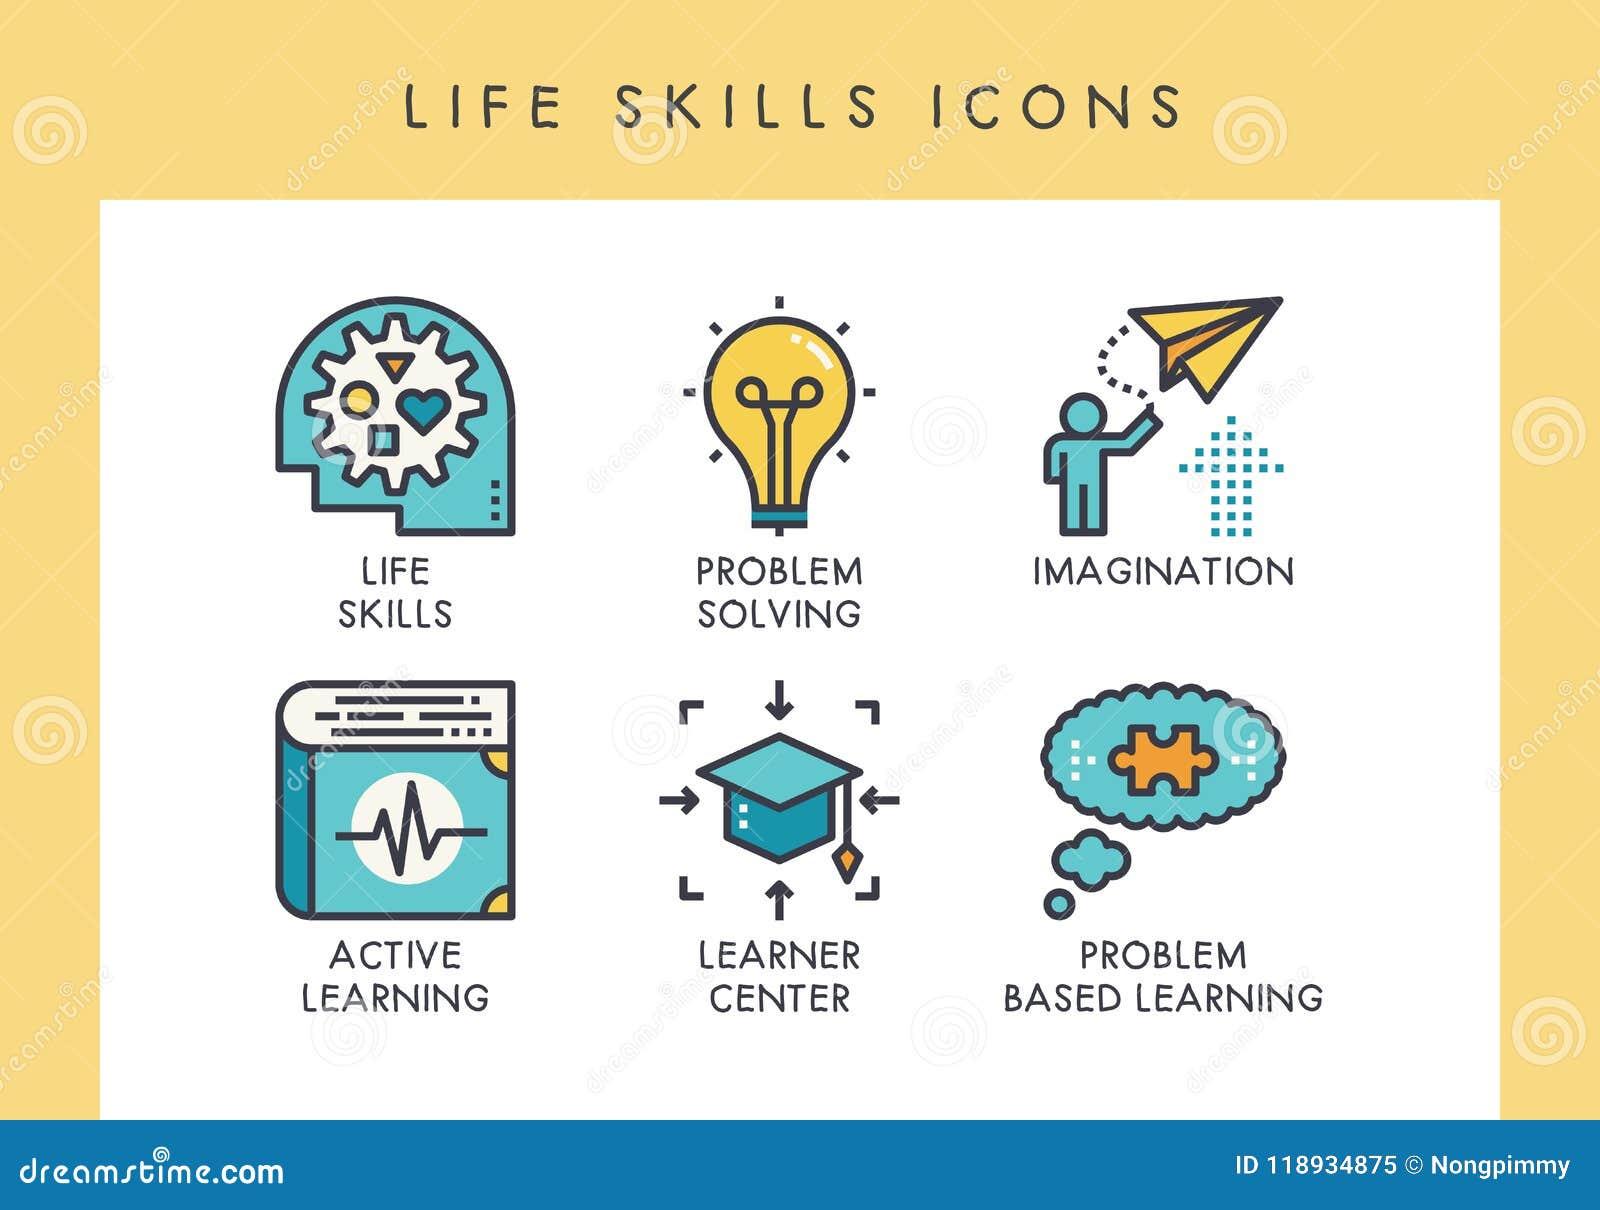 Icônes de qualifications de la vie